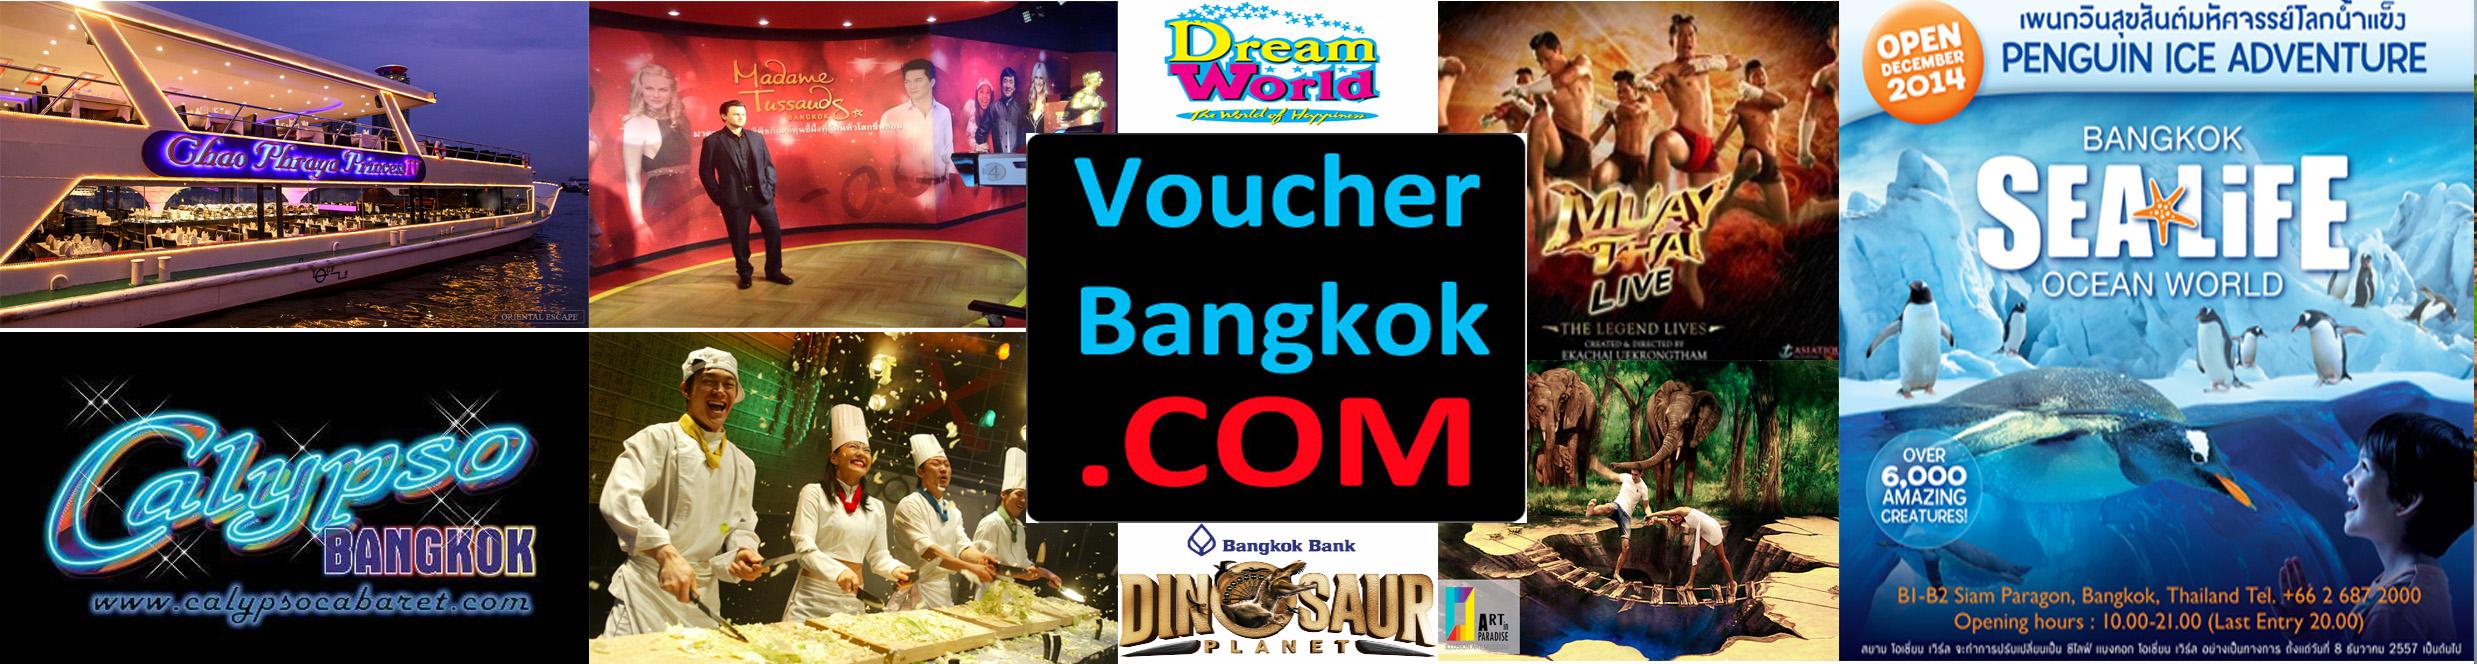 voucher bangkok opening